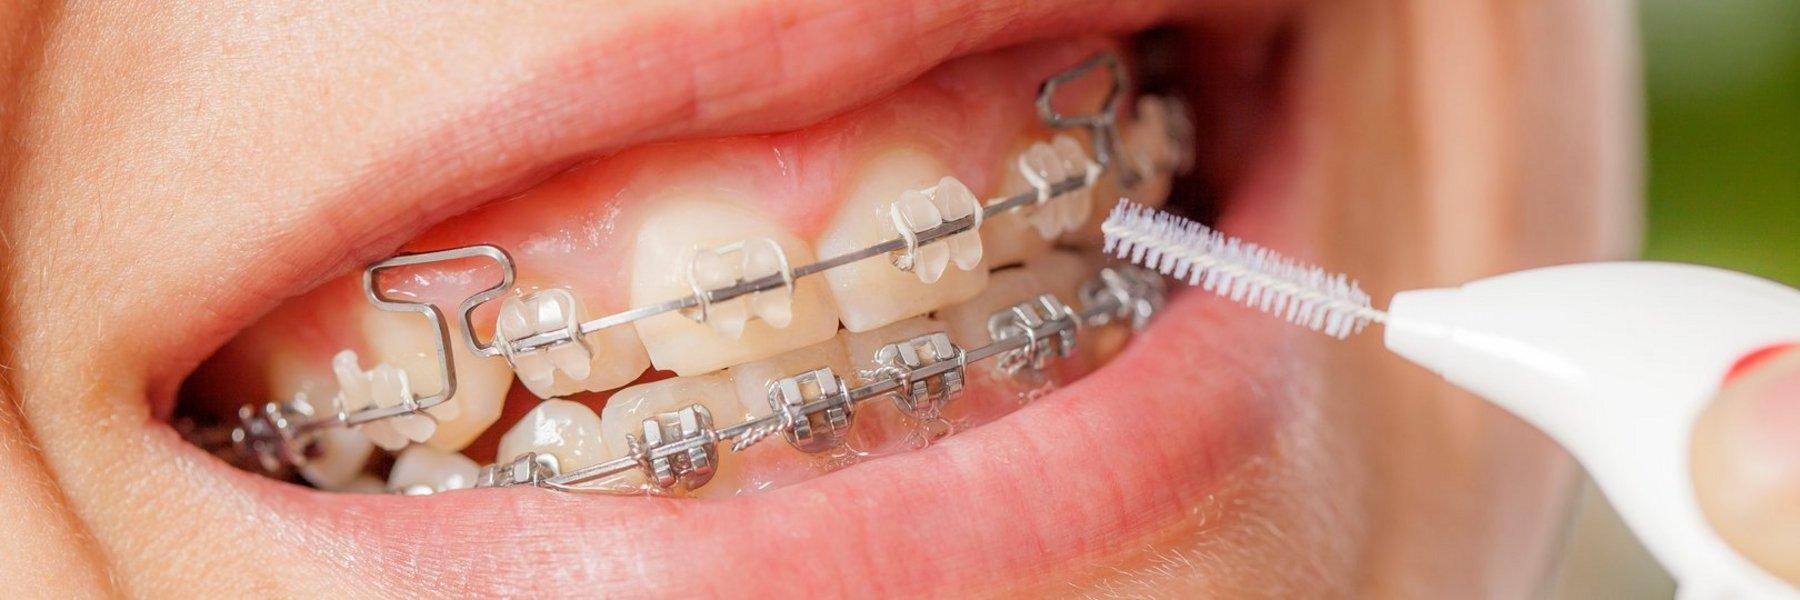 Zahnspange außenbogen Außenbogen zahnspange